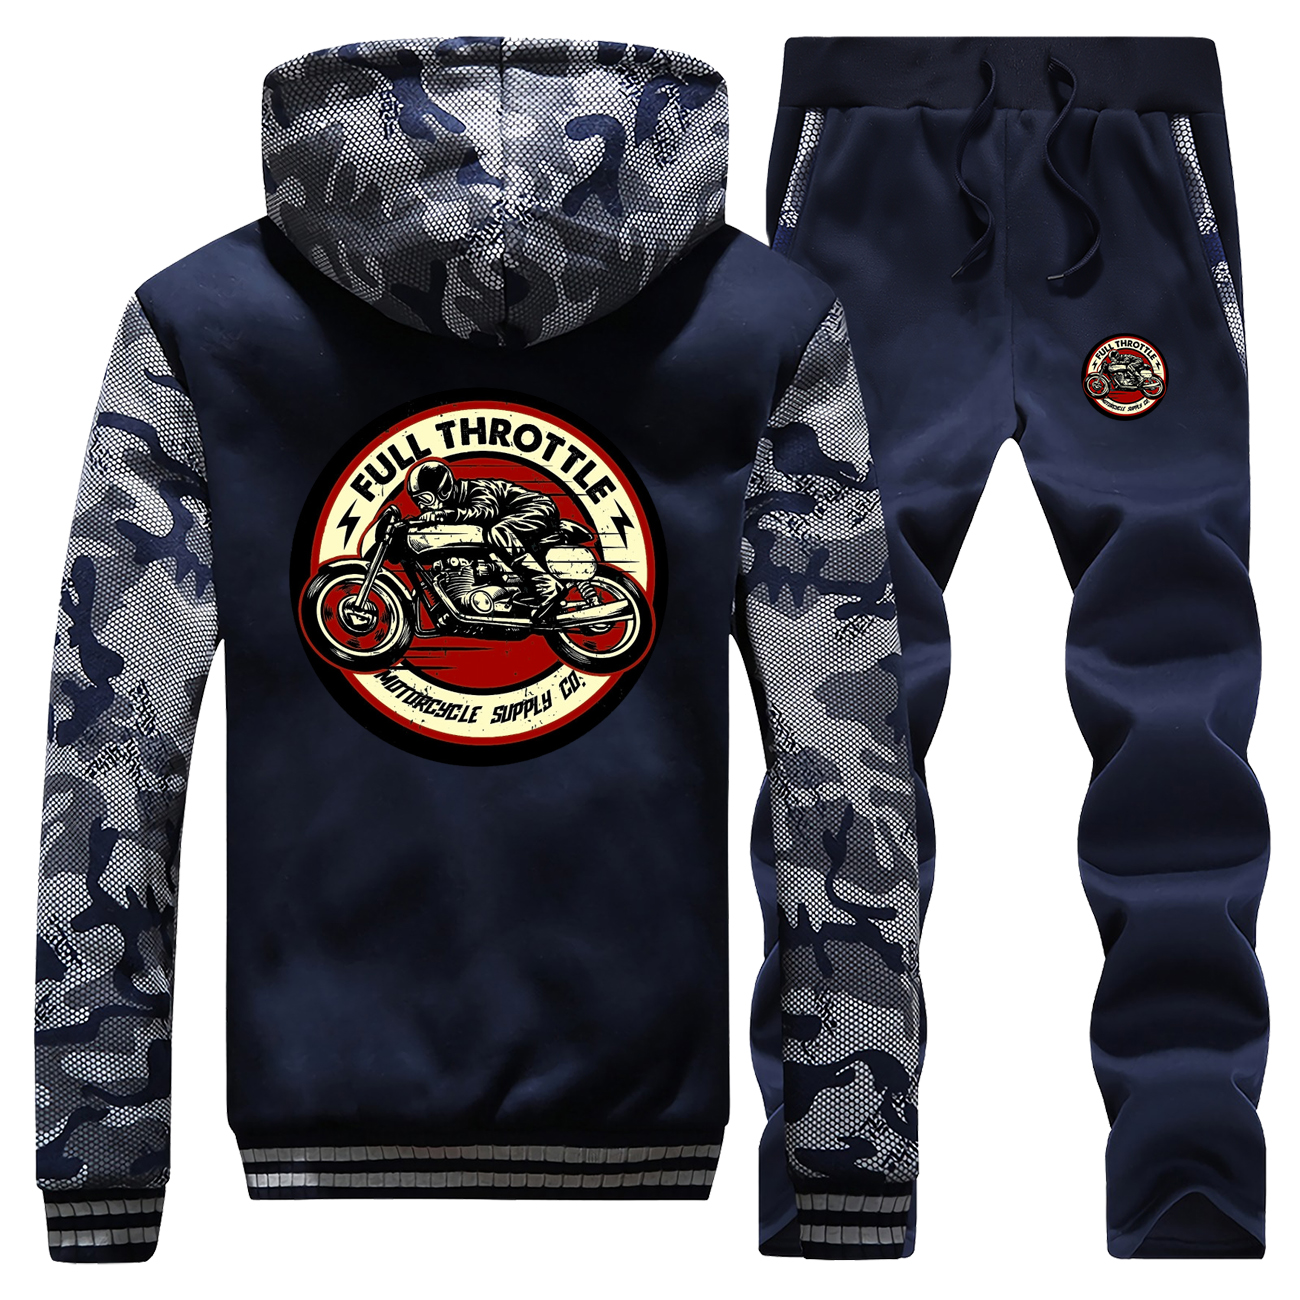 New Winter Full Throttle Cafe Racer Rockabilly Biker Hoodie Mens Streetwear Camouflage Coat Thick Suit+Pants 2 Piece Set Pants